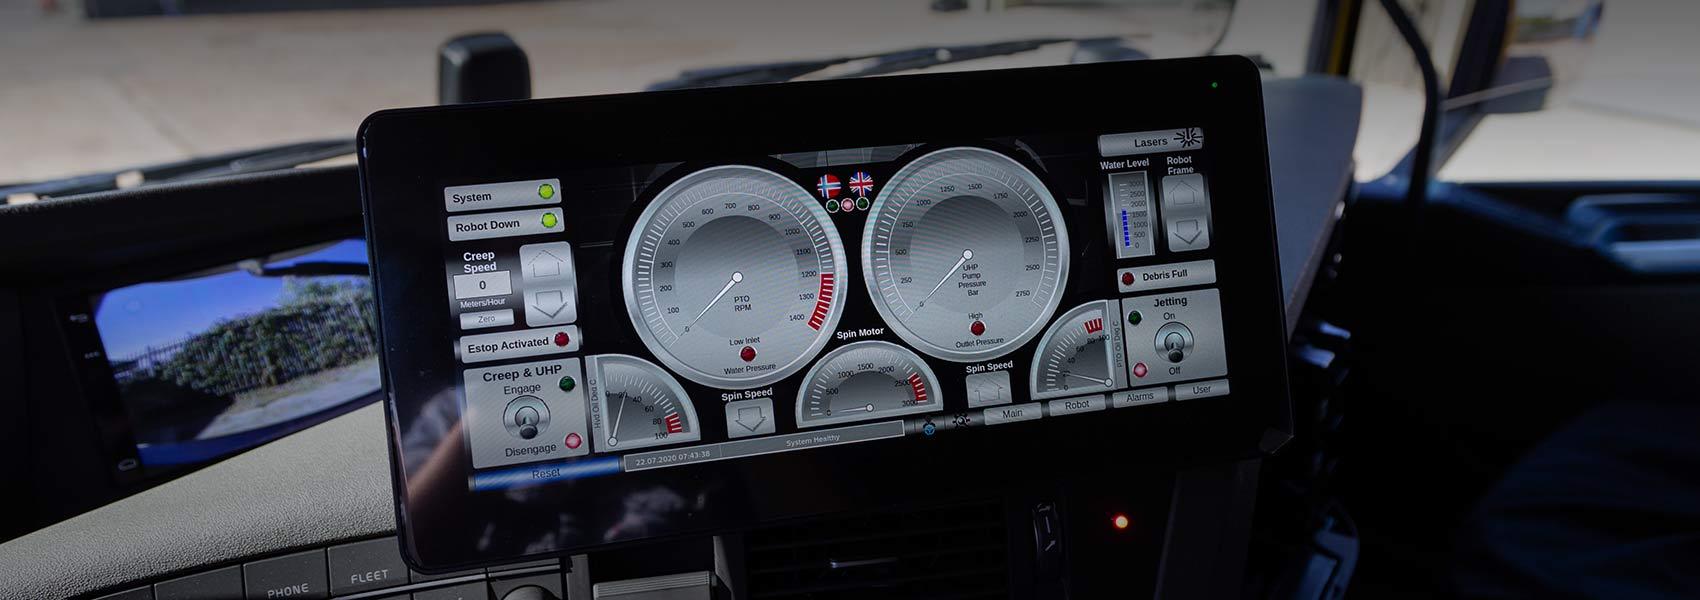 Enhanced control systems for Osprey